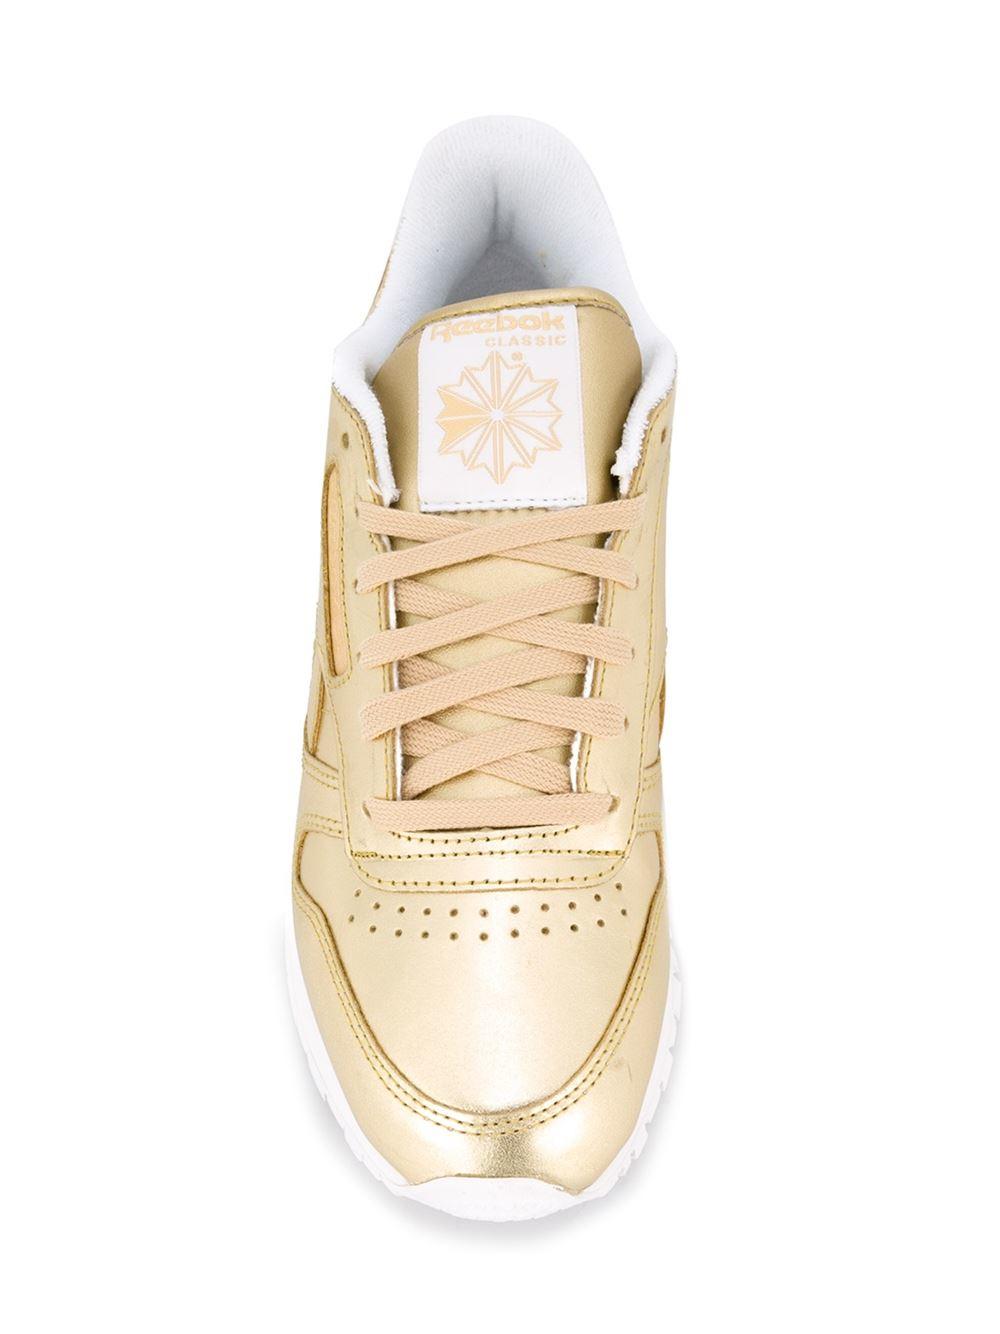 Reebok Leather Classic Spirit x FACE Stockholm Sneakers in Metallic